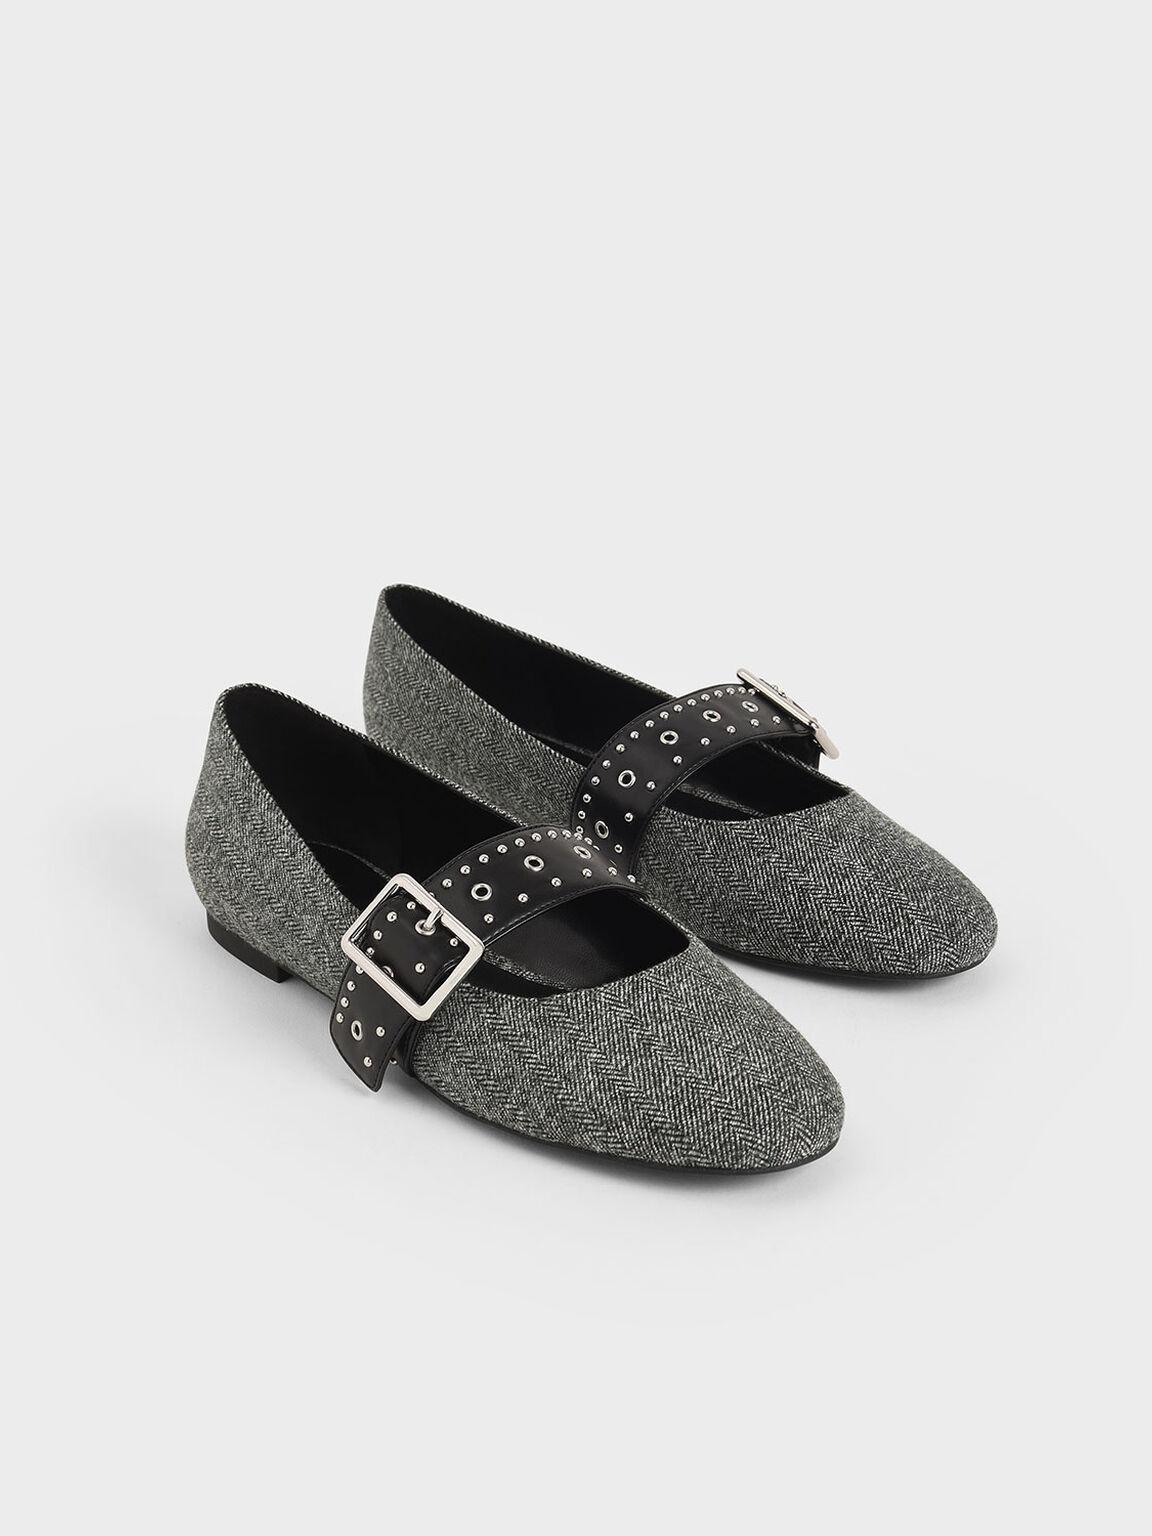 Woven Studded Mary Jane Flats, Dark Grey, hi-res